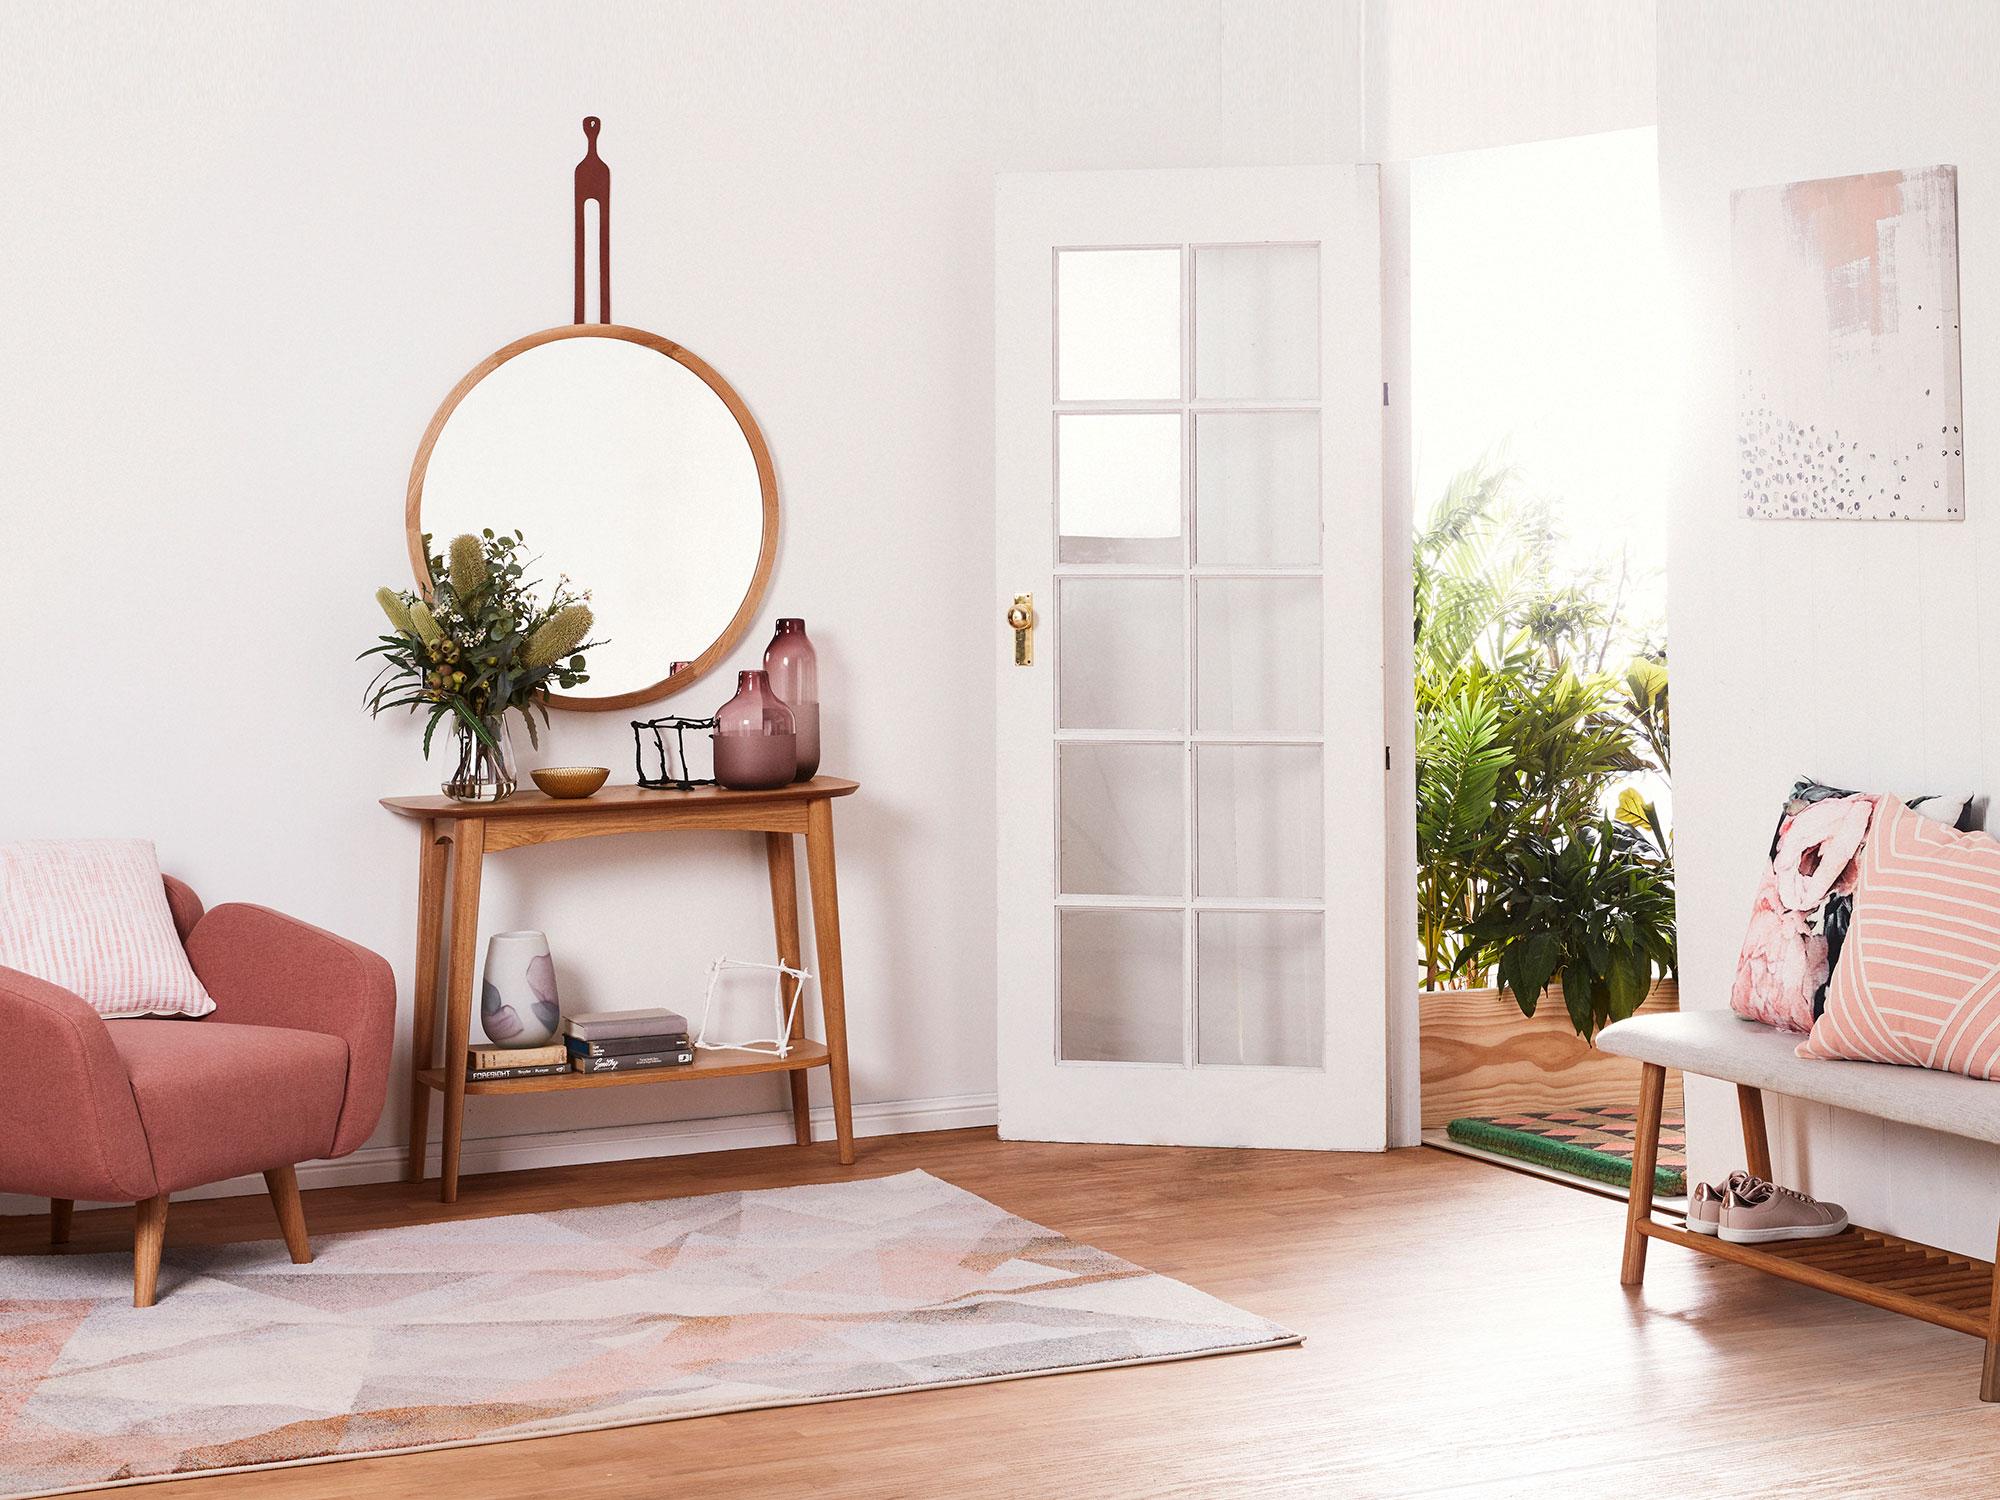 Hallway Decorating Ideas  realestatecomau